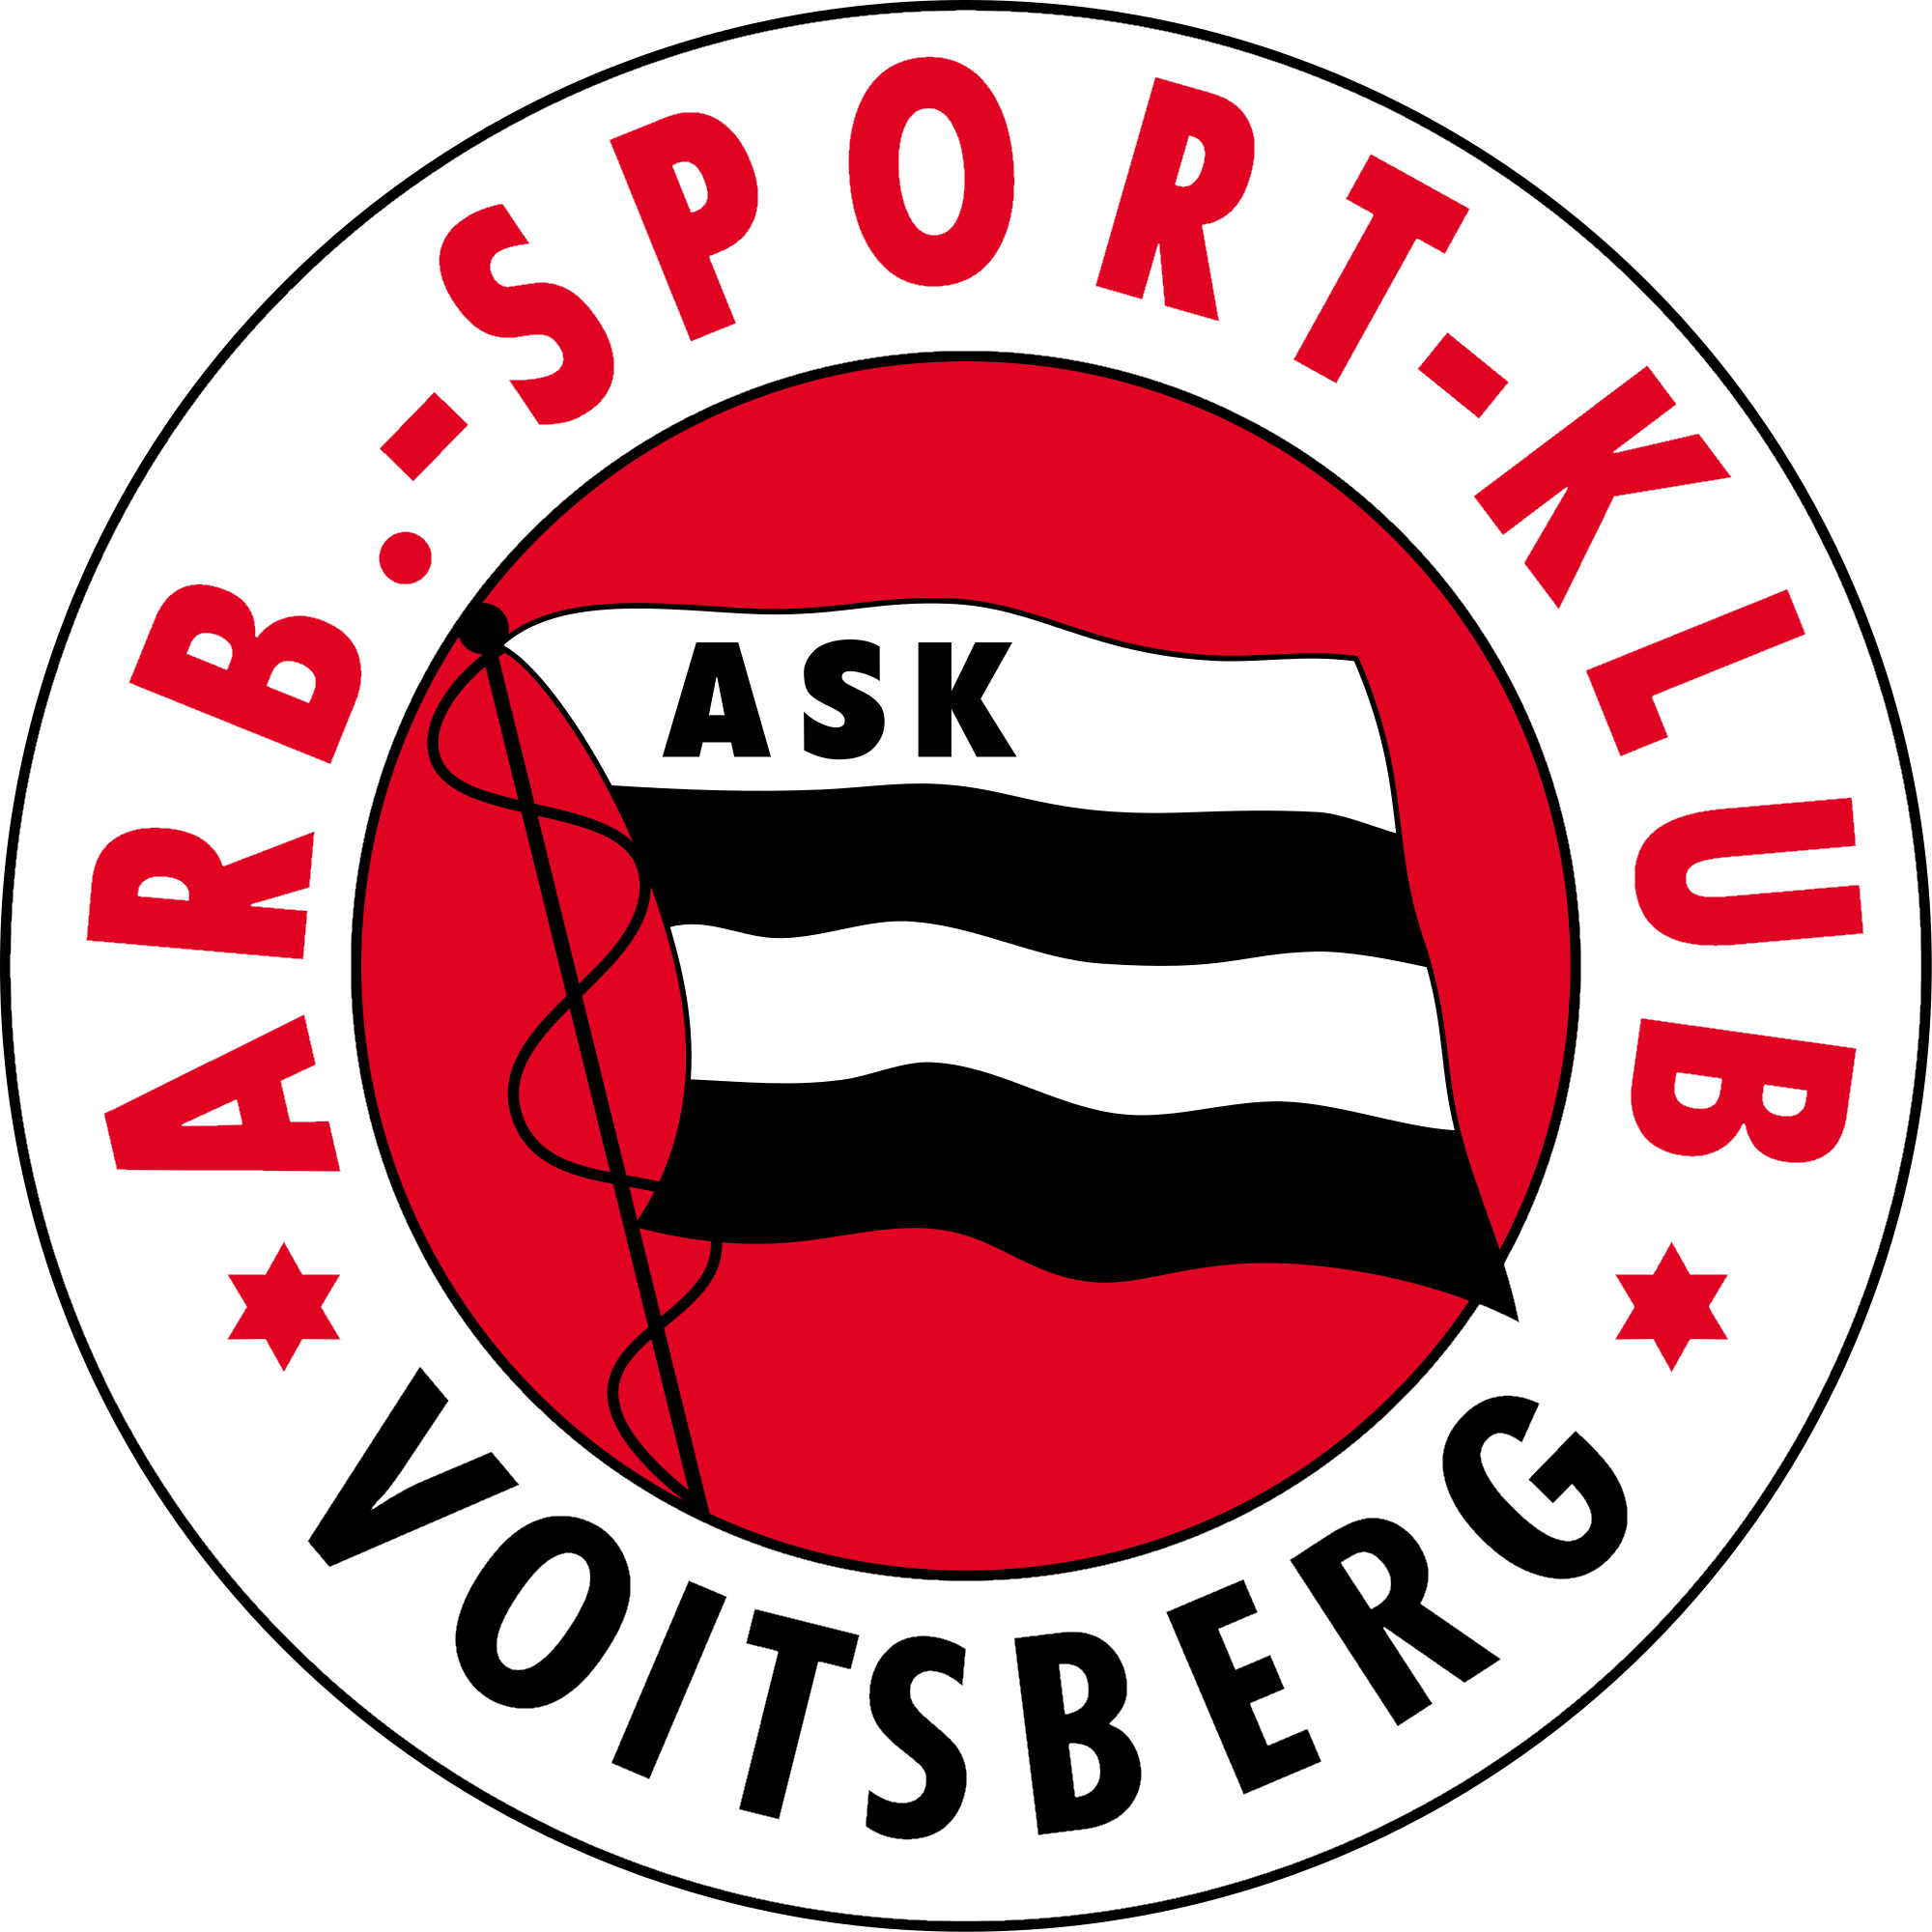 österreich landesliga